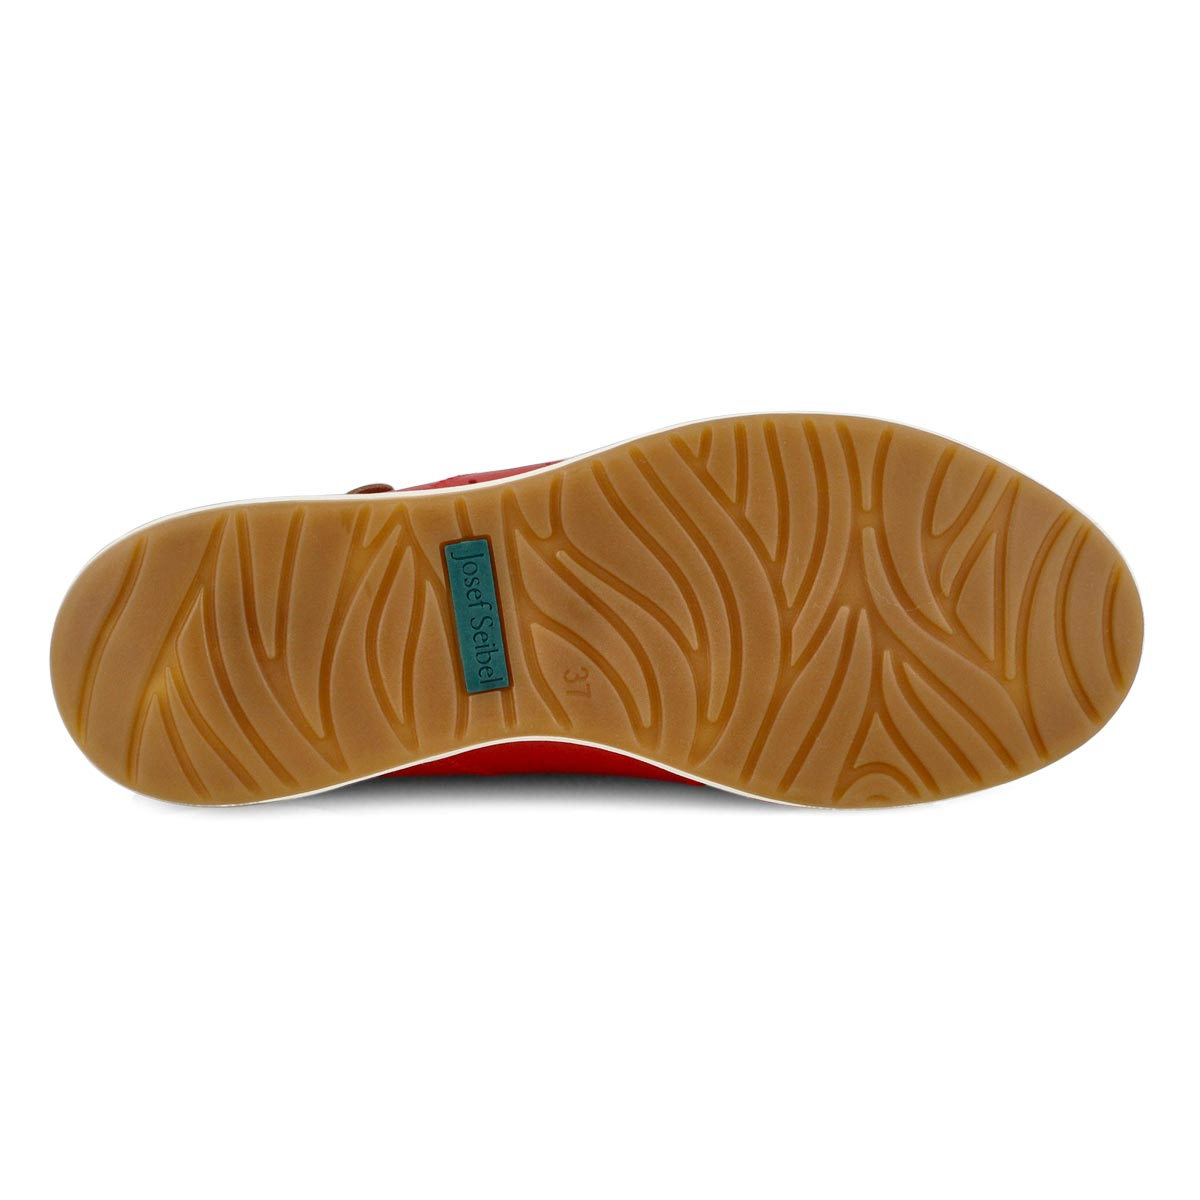 Women's Caren 01 Lace Up Sneaker - Red